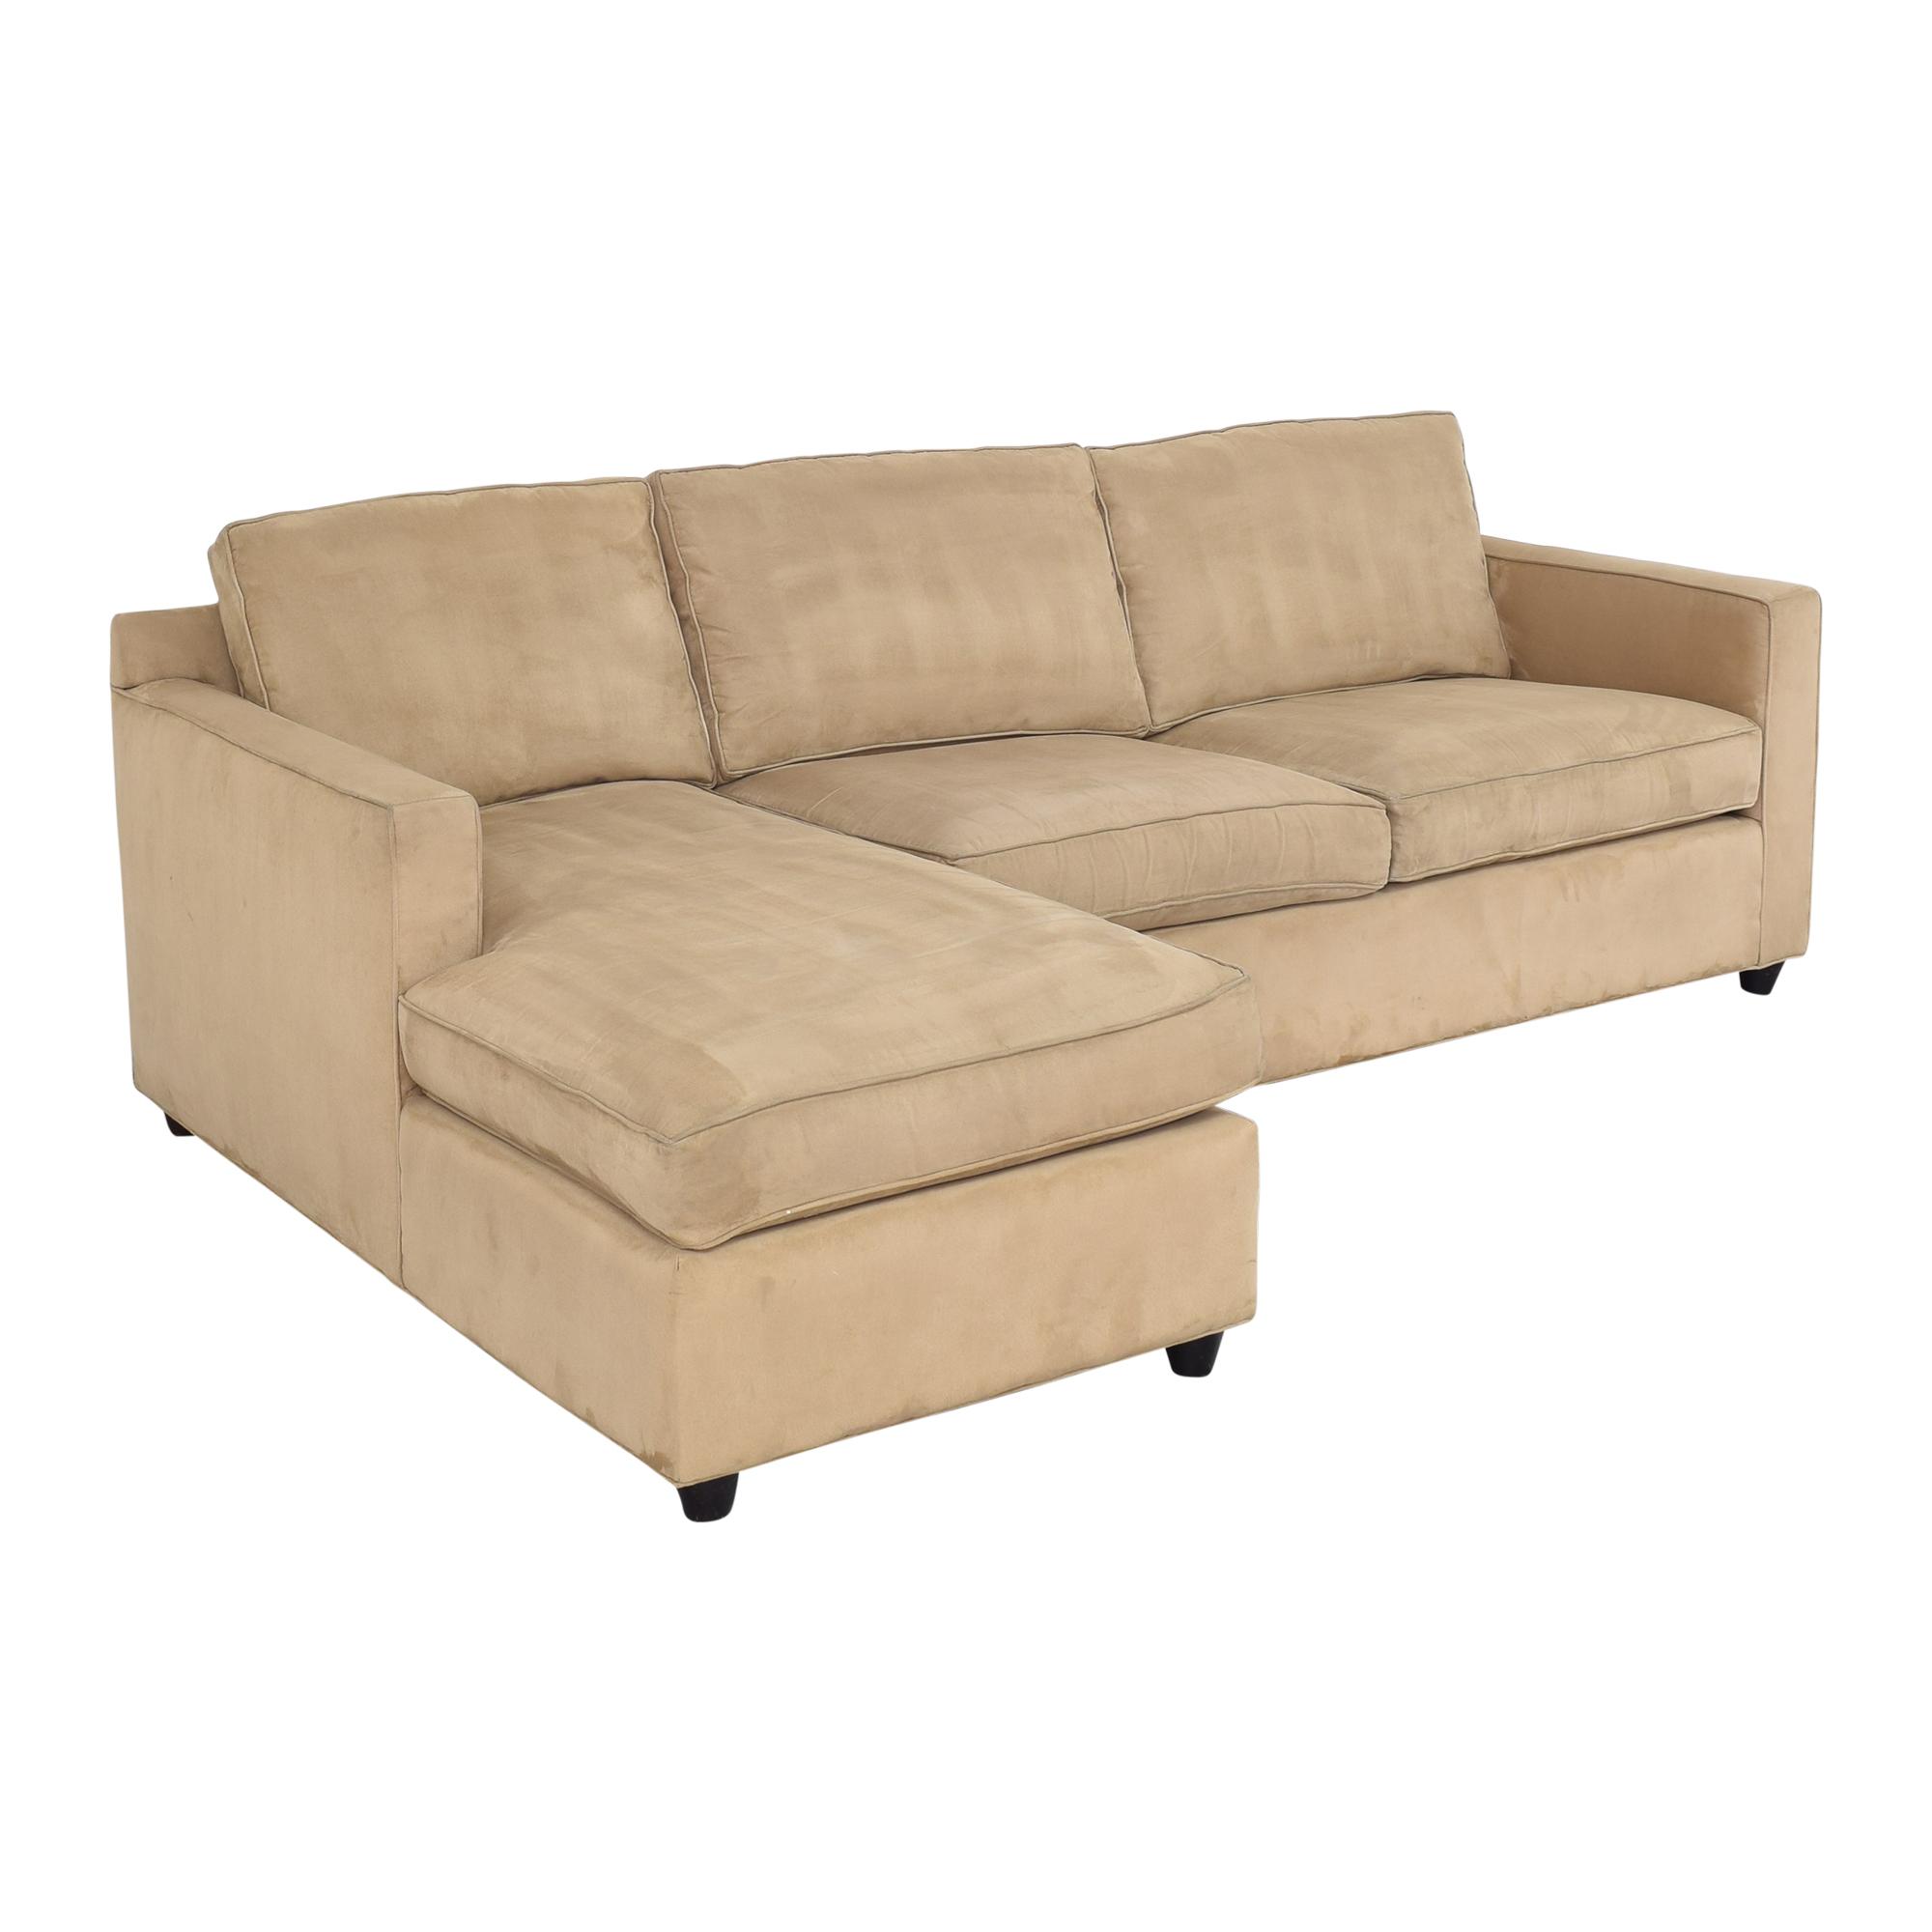 Crate & Barrel Crate & Barrel Barrett Chaise Sectional Sofa dimensions